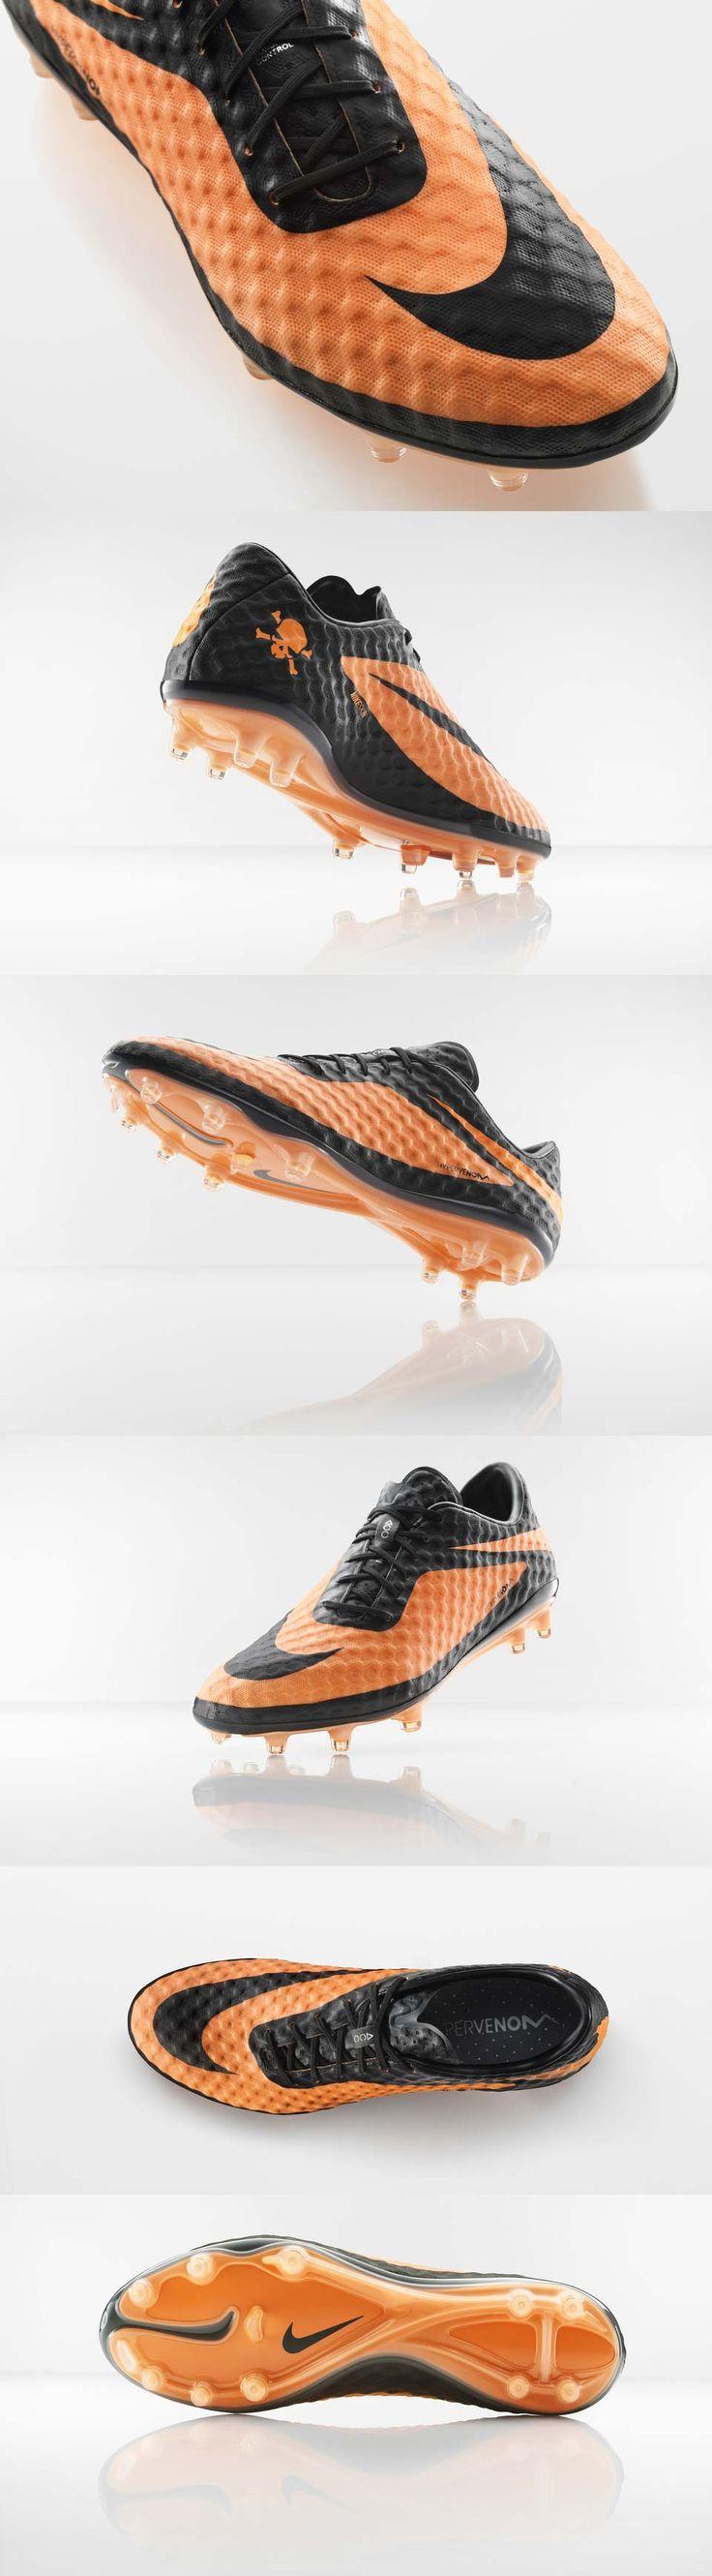 Nike Hypervenom Socer Cleats... I just need these like I don't think you know SOOOOOOOOOOOOOOOO BAD!!!